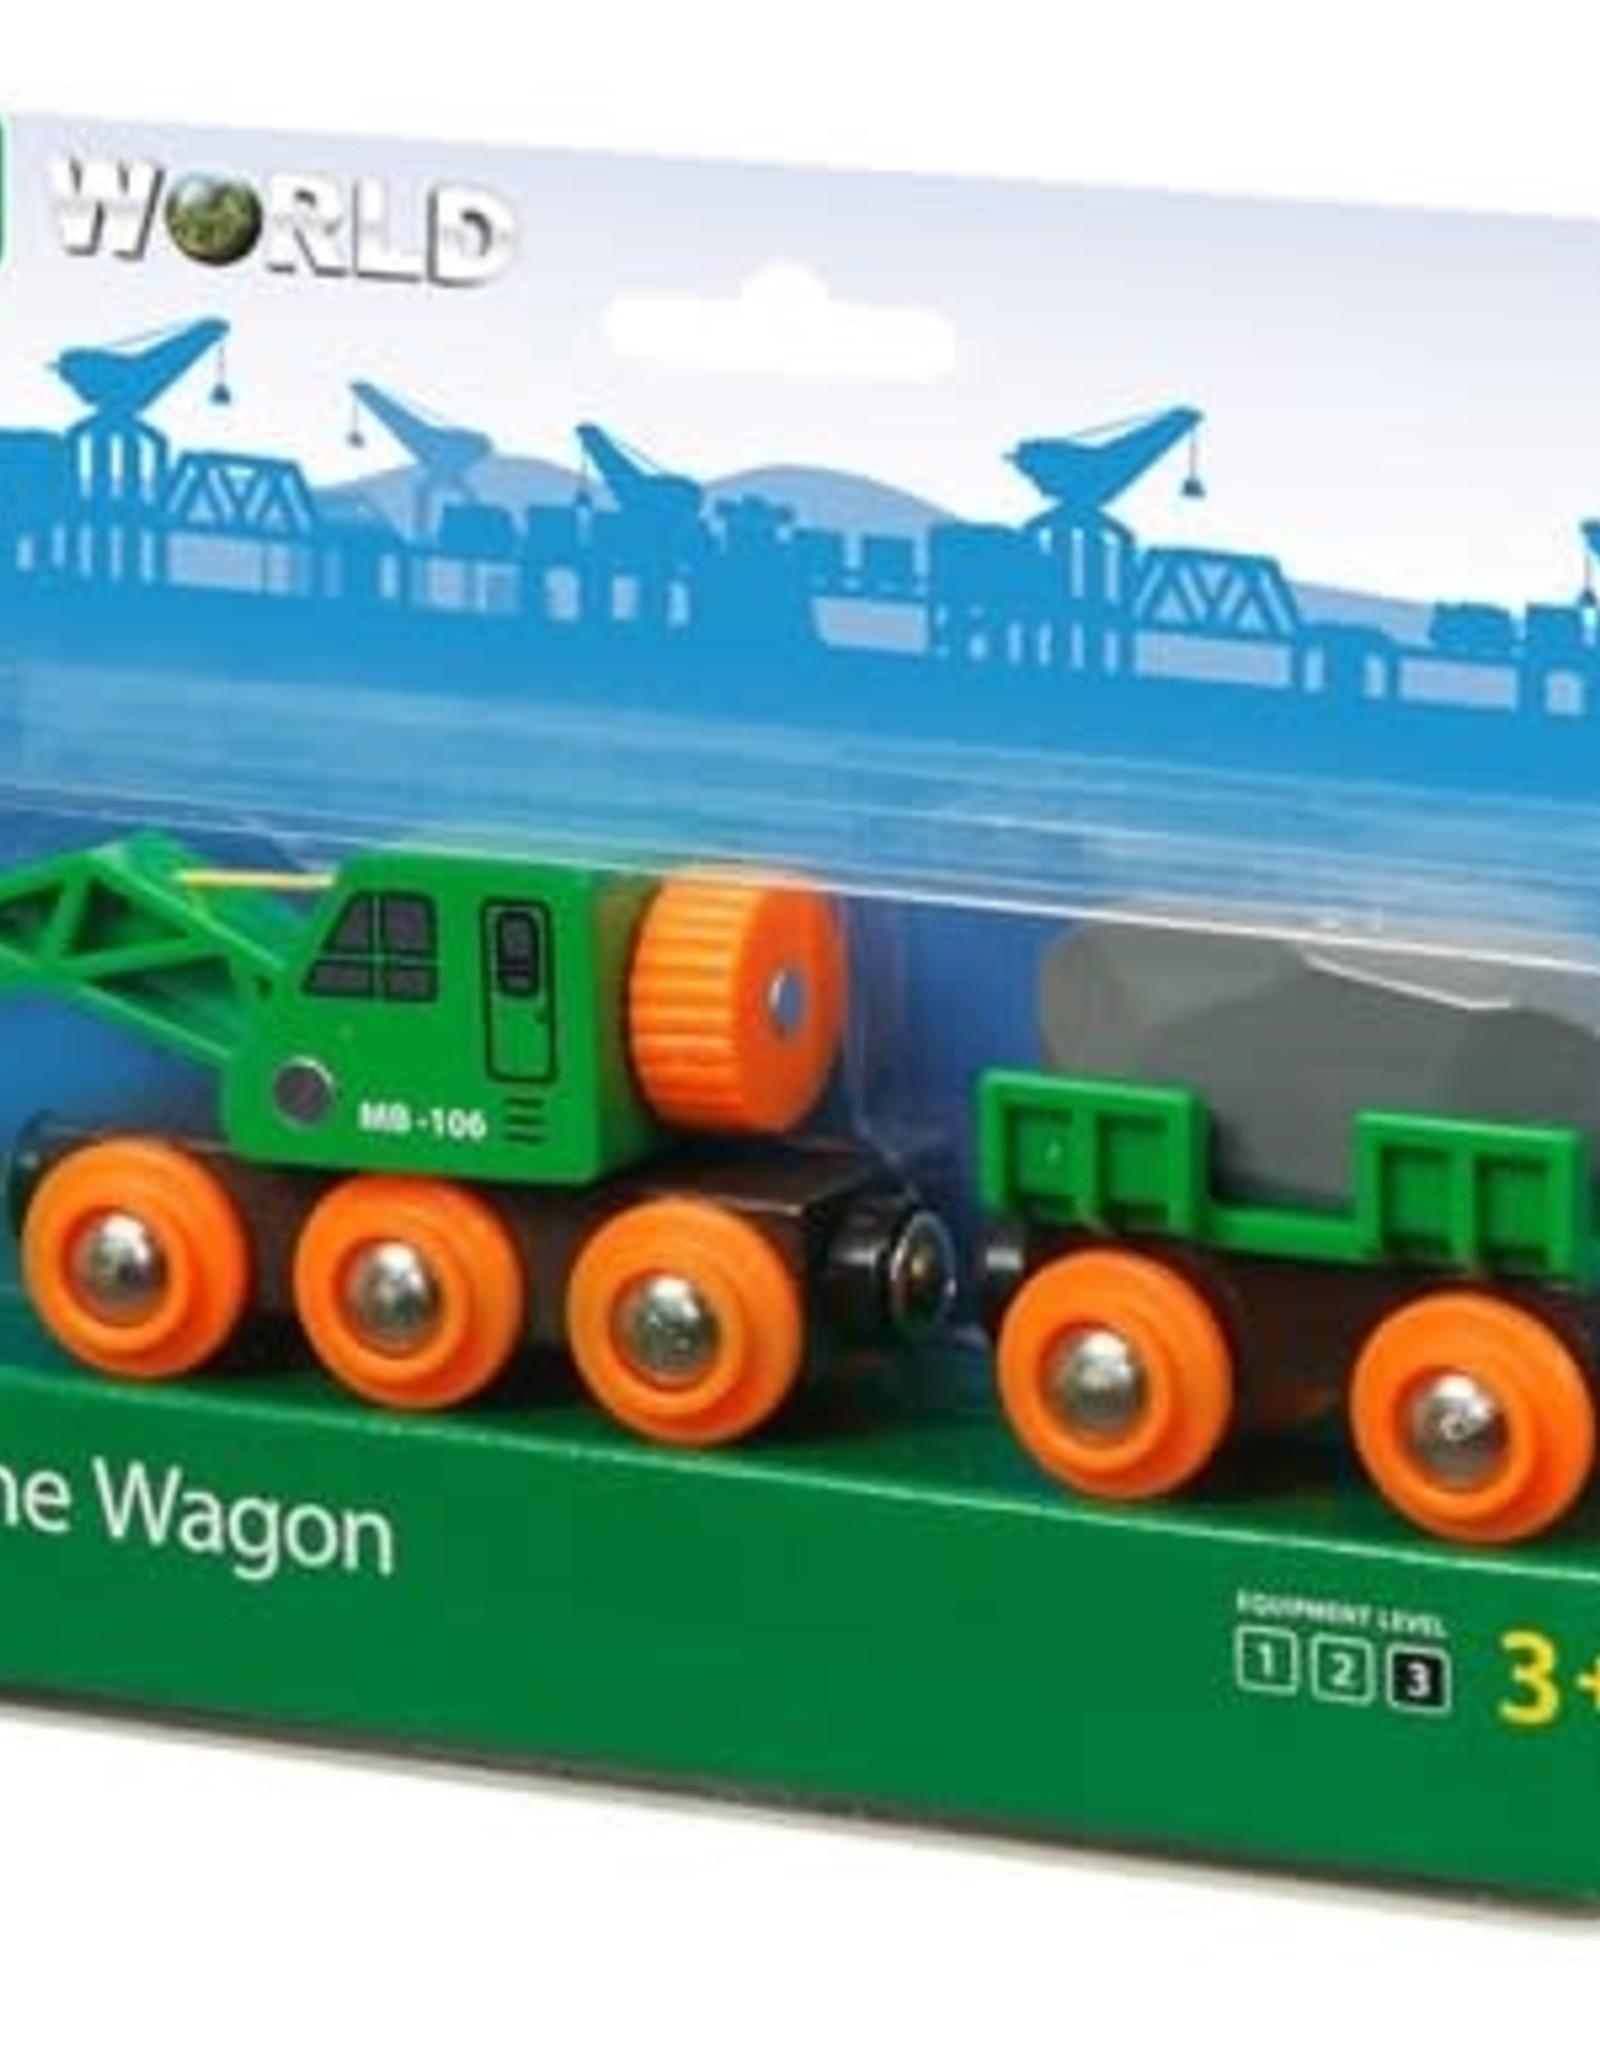 Ravensburger Clever Crane Wagon